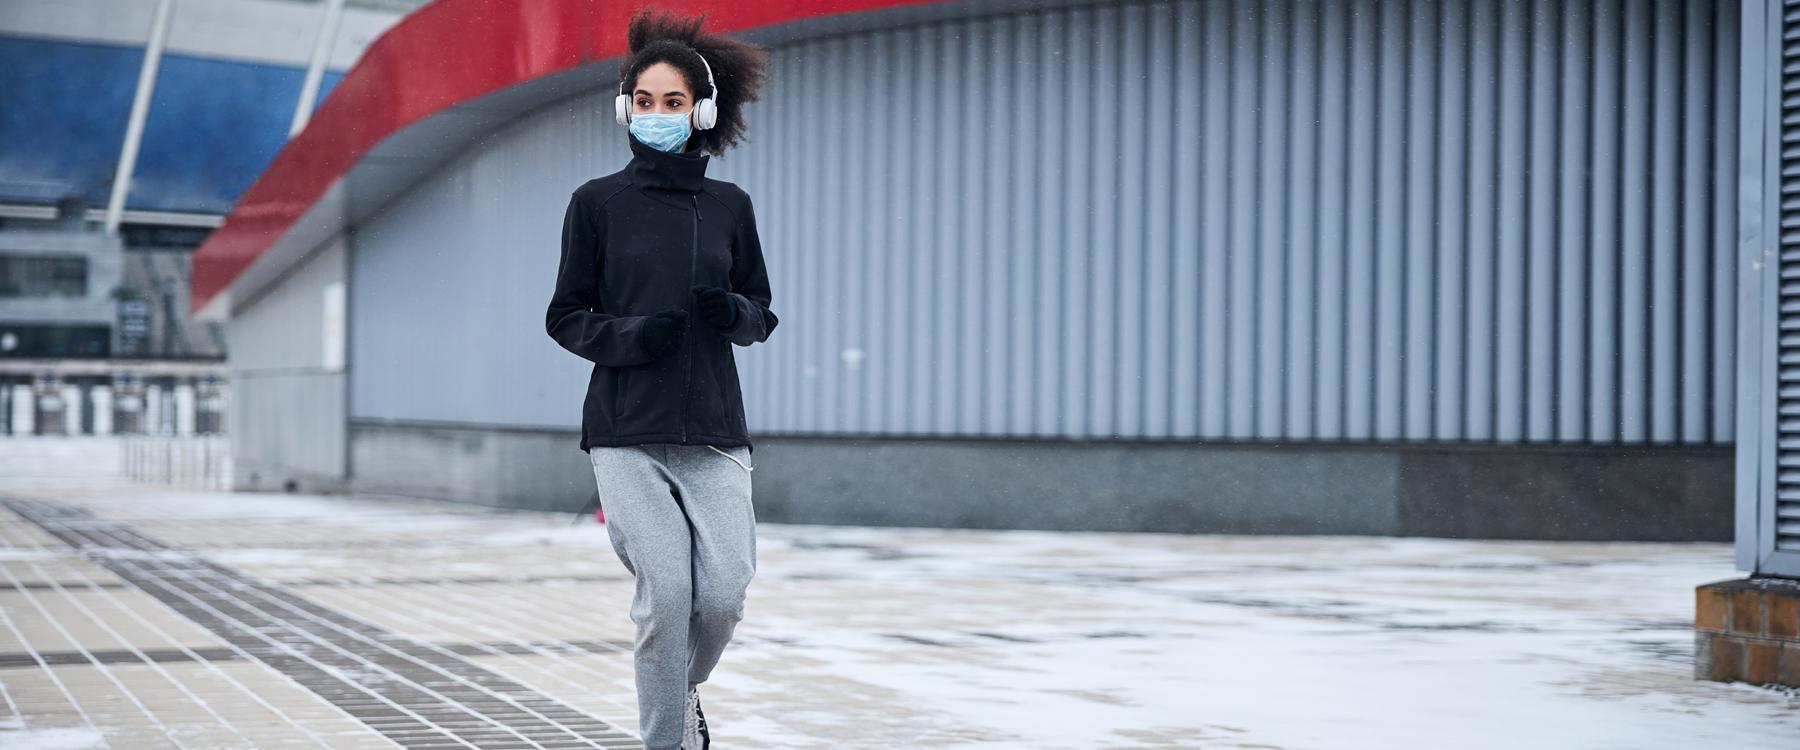 Woman running outdoors, wearing a mask.